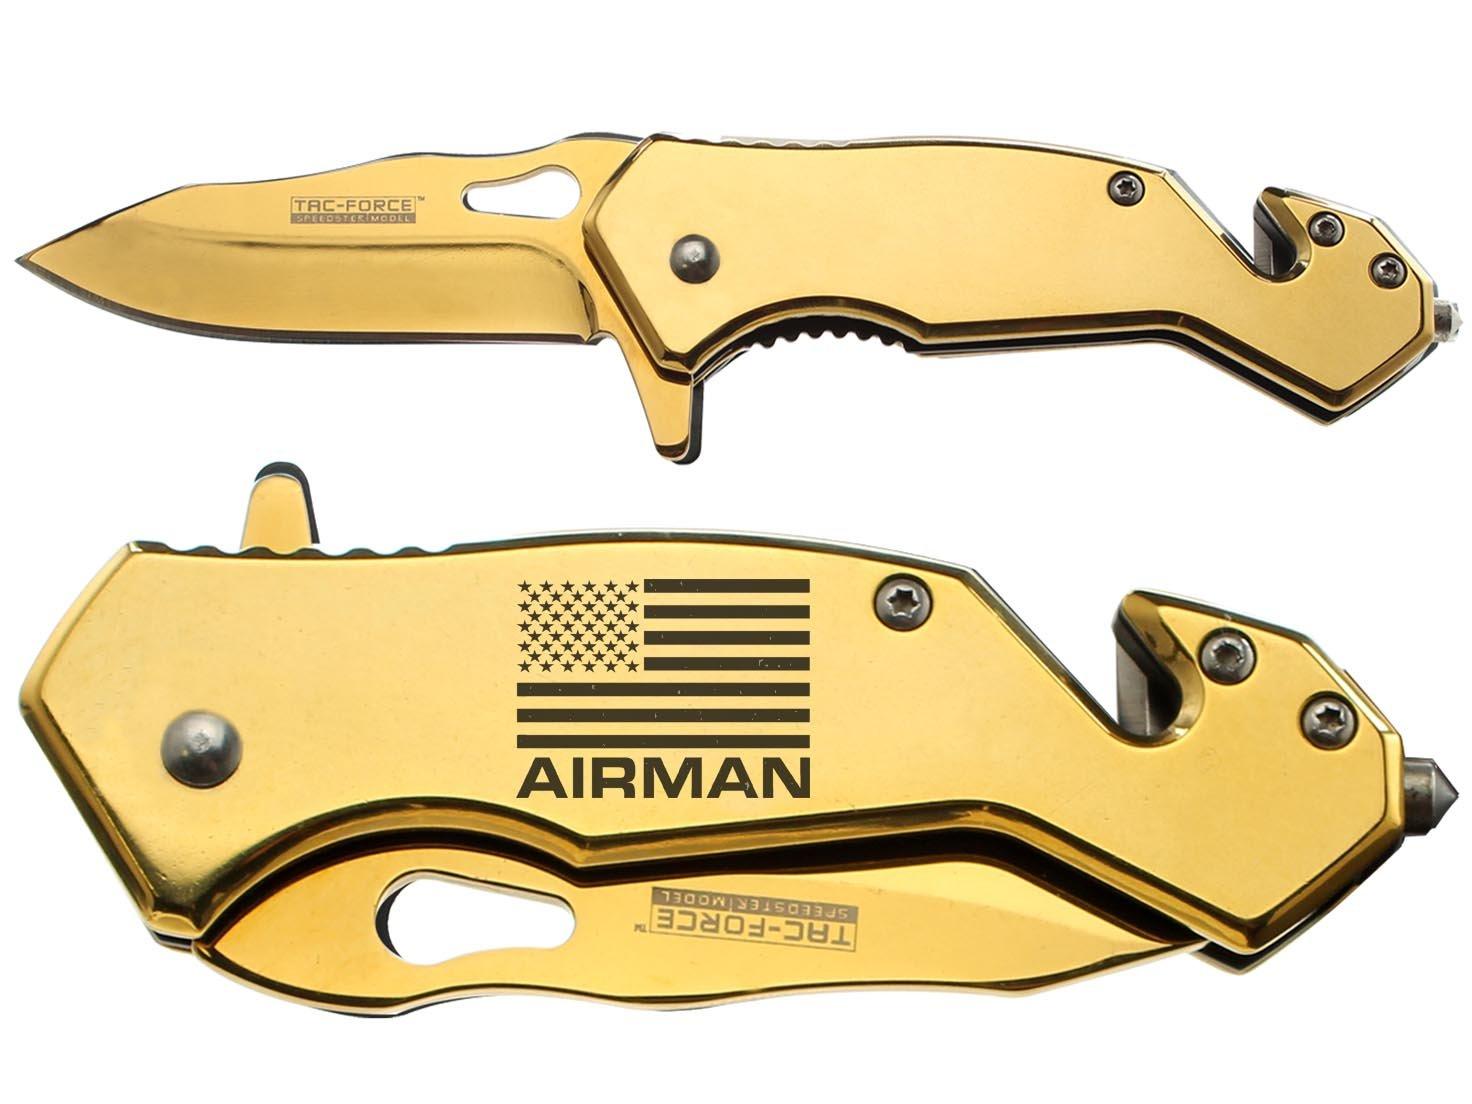 NDZ Performance Tac-Force 6.5'' Tactical Rescue Folding Knife Glass Breaker Seat-Belt Cutter 903GD Compact Gold Us Flag Air Man 001